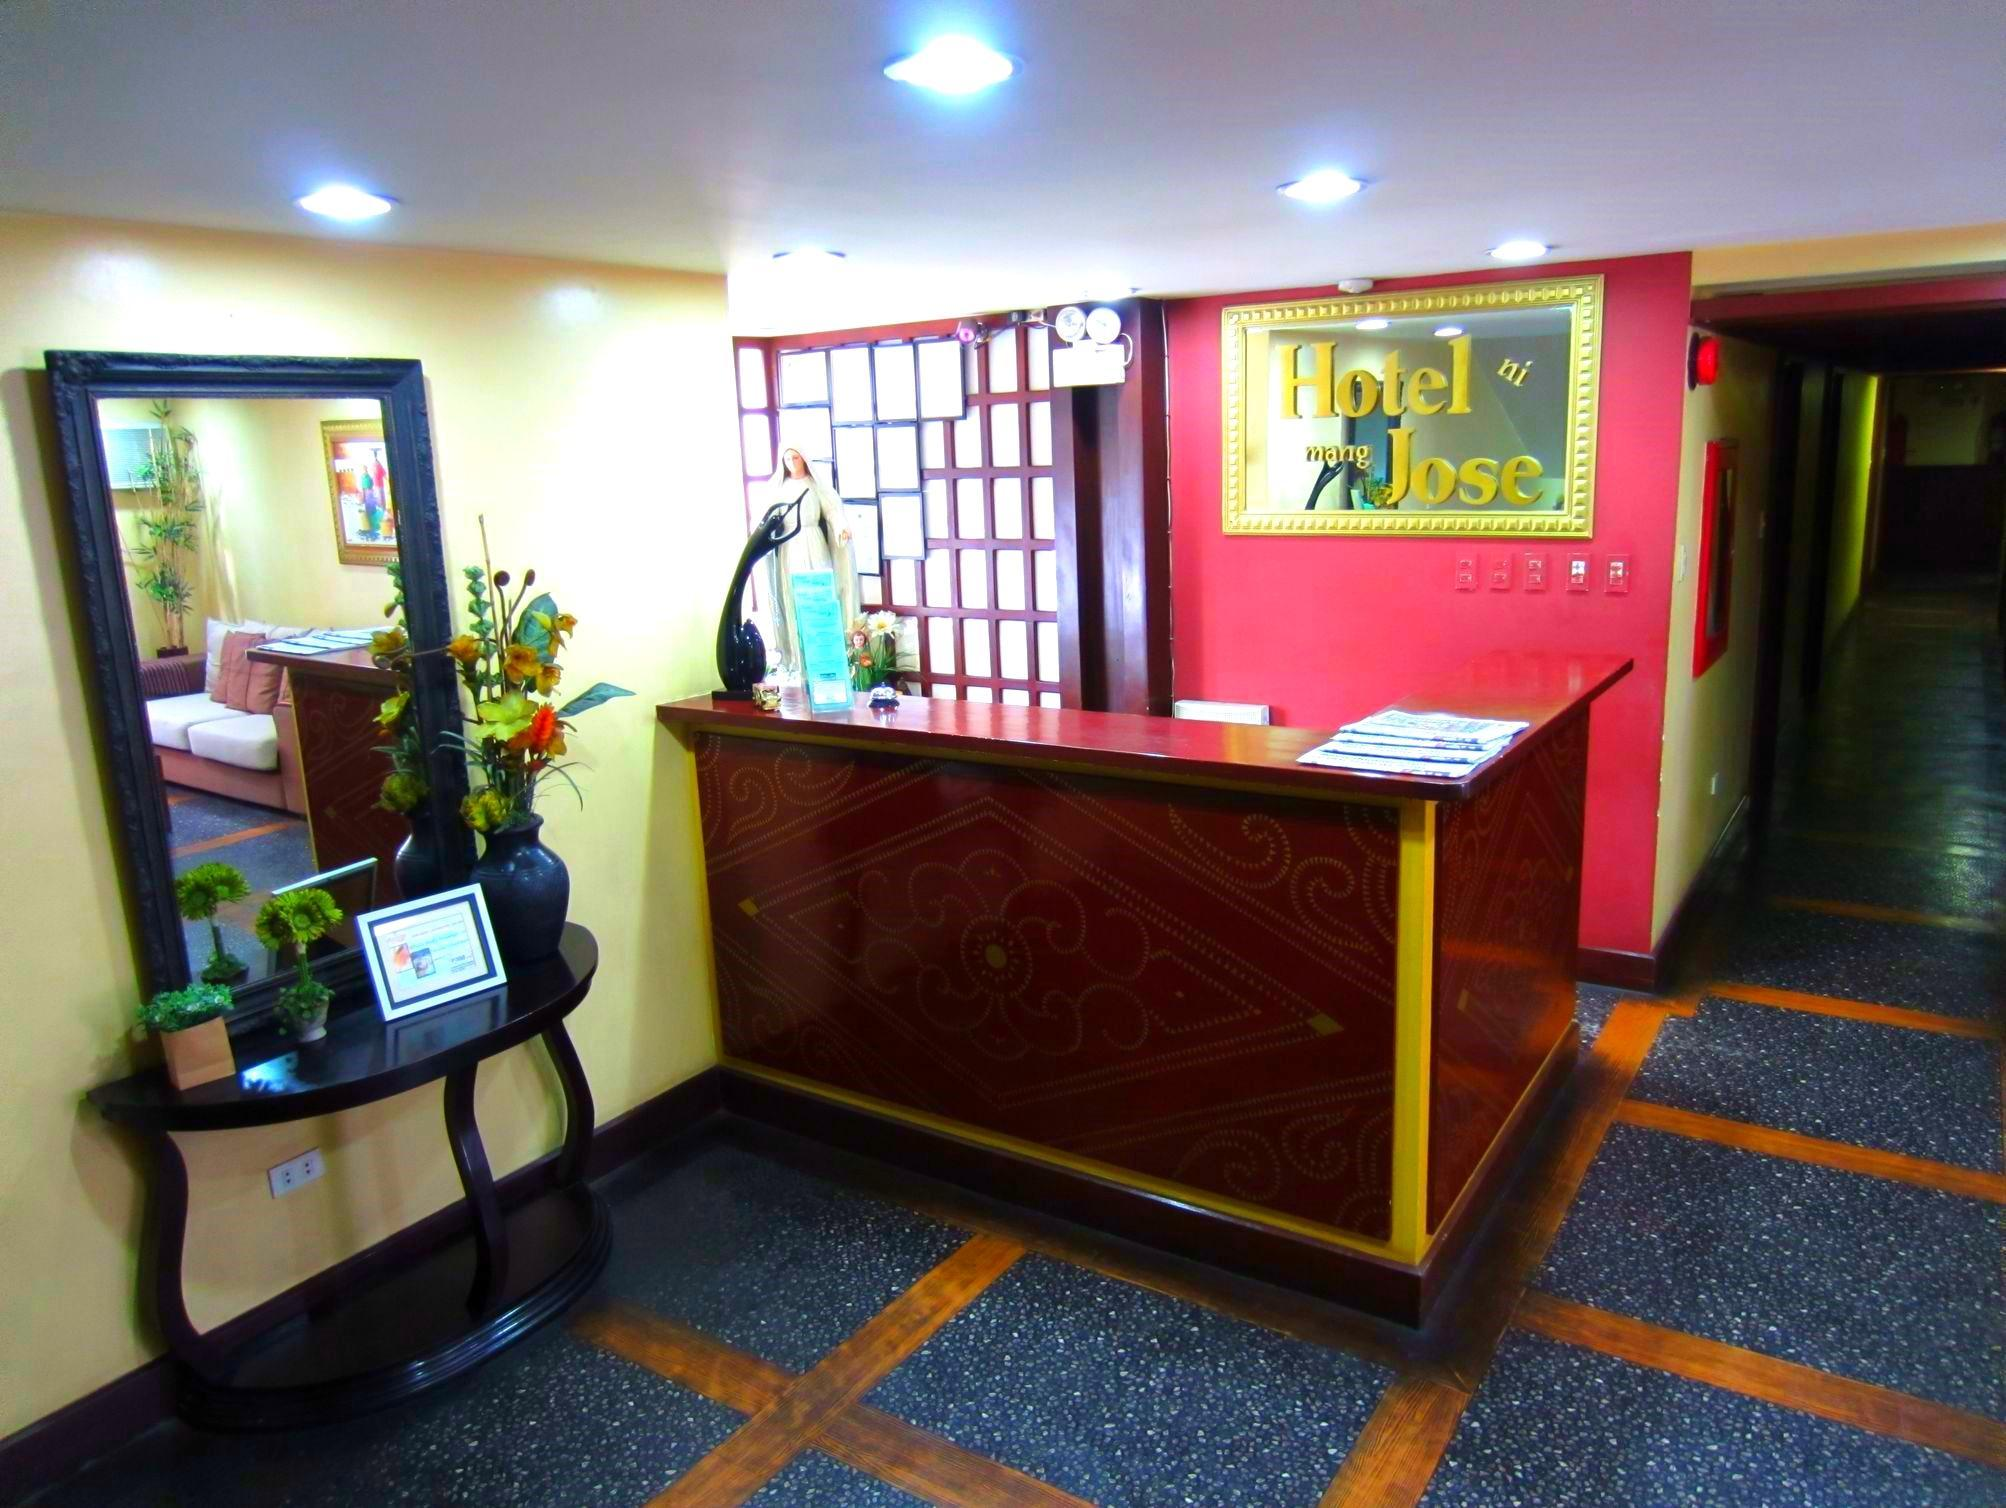 Hotel ni Mang Jose, Lipa City